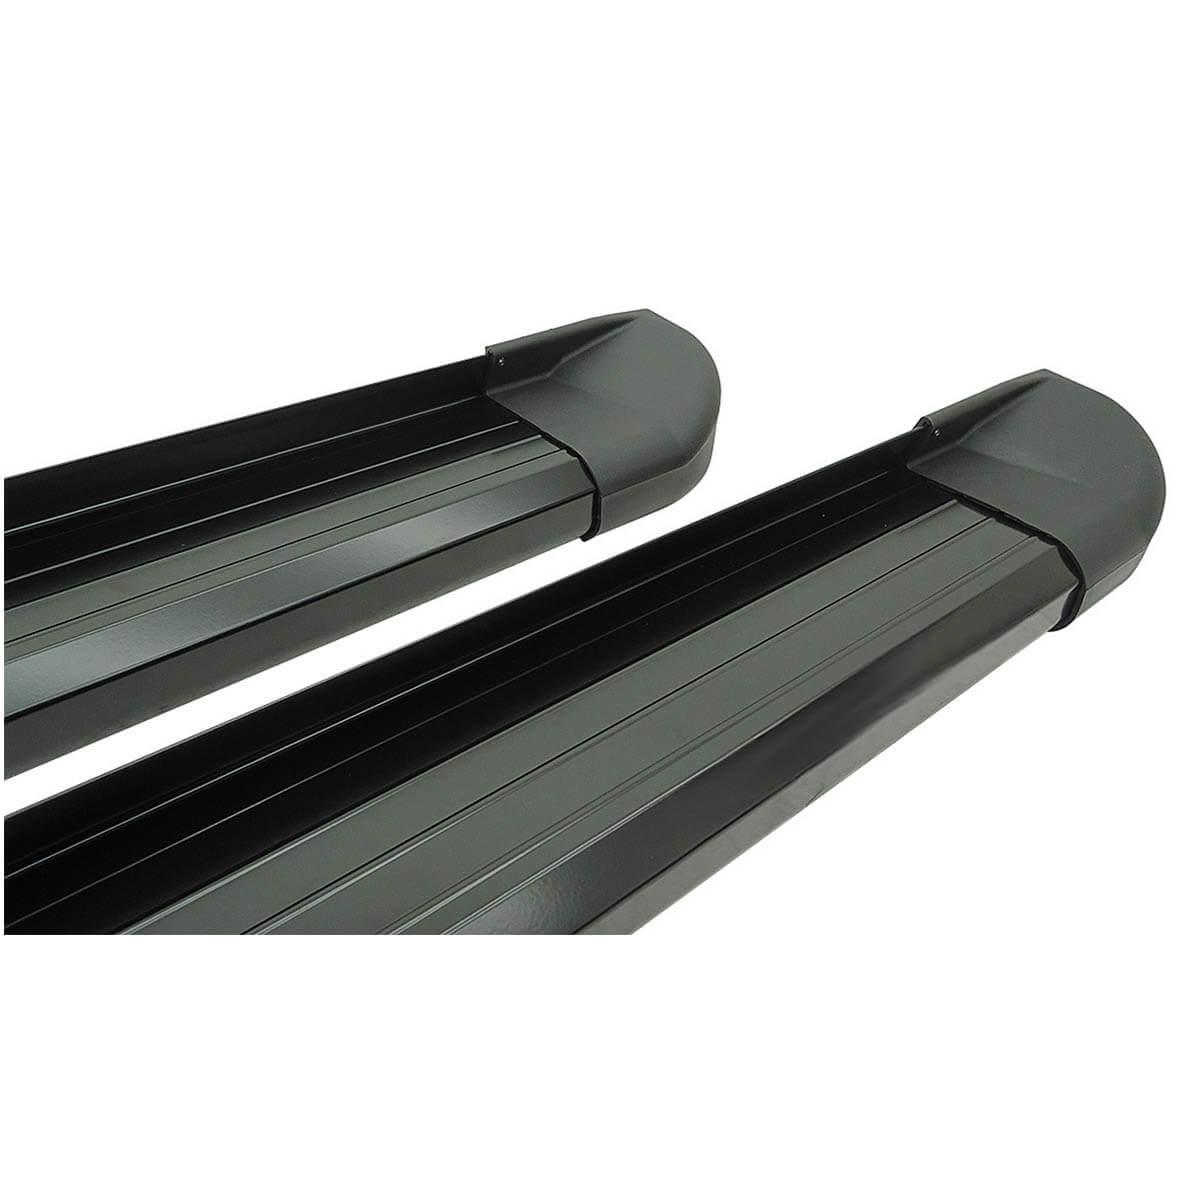 Estribo plataforma alumínio preto Duster 2012 a 2017